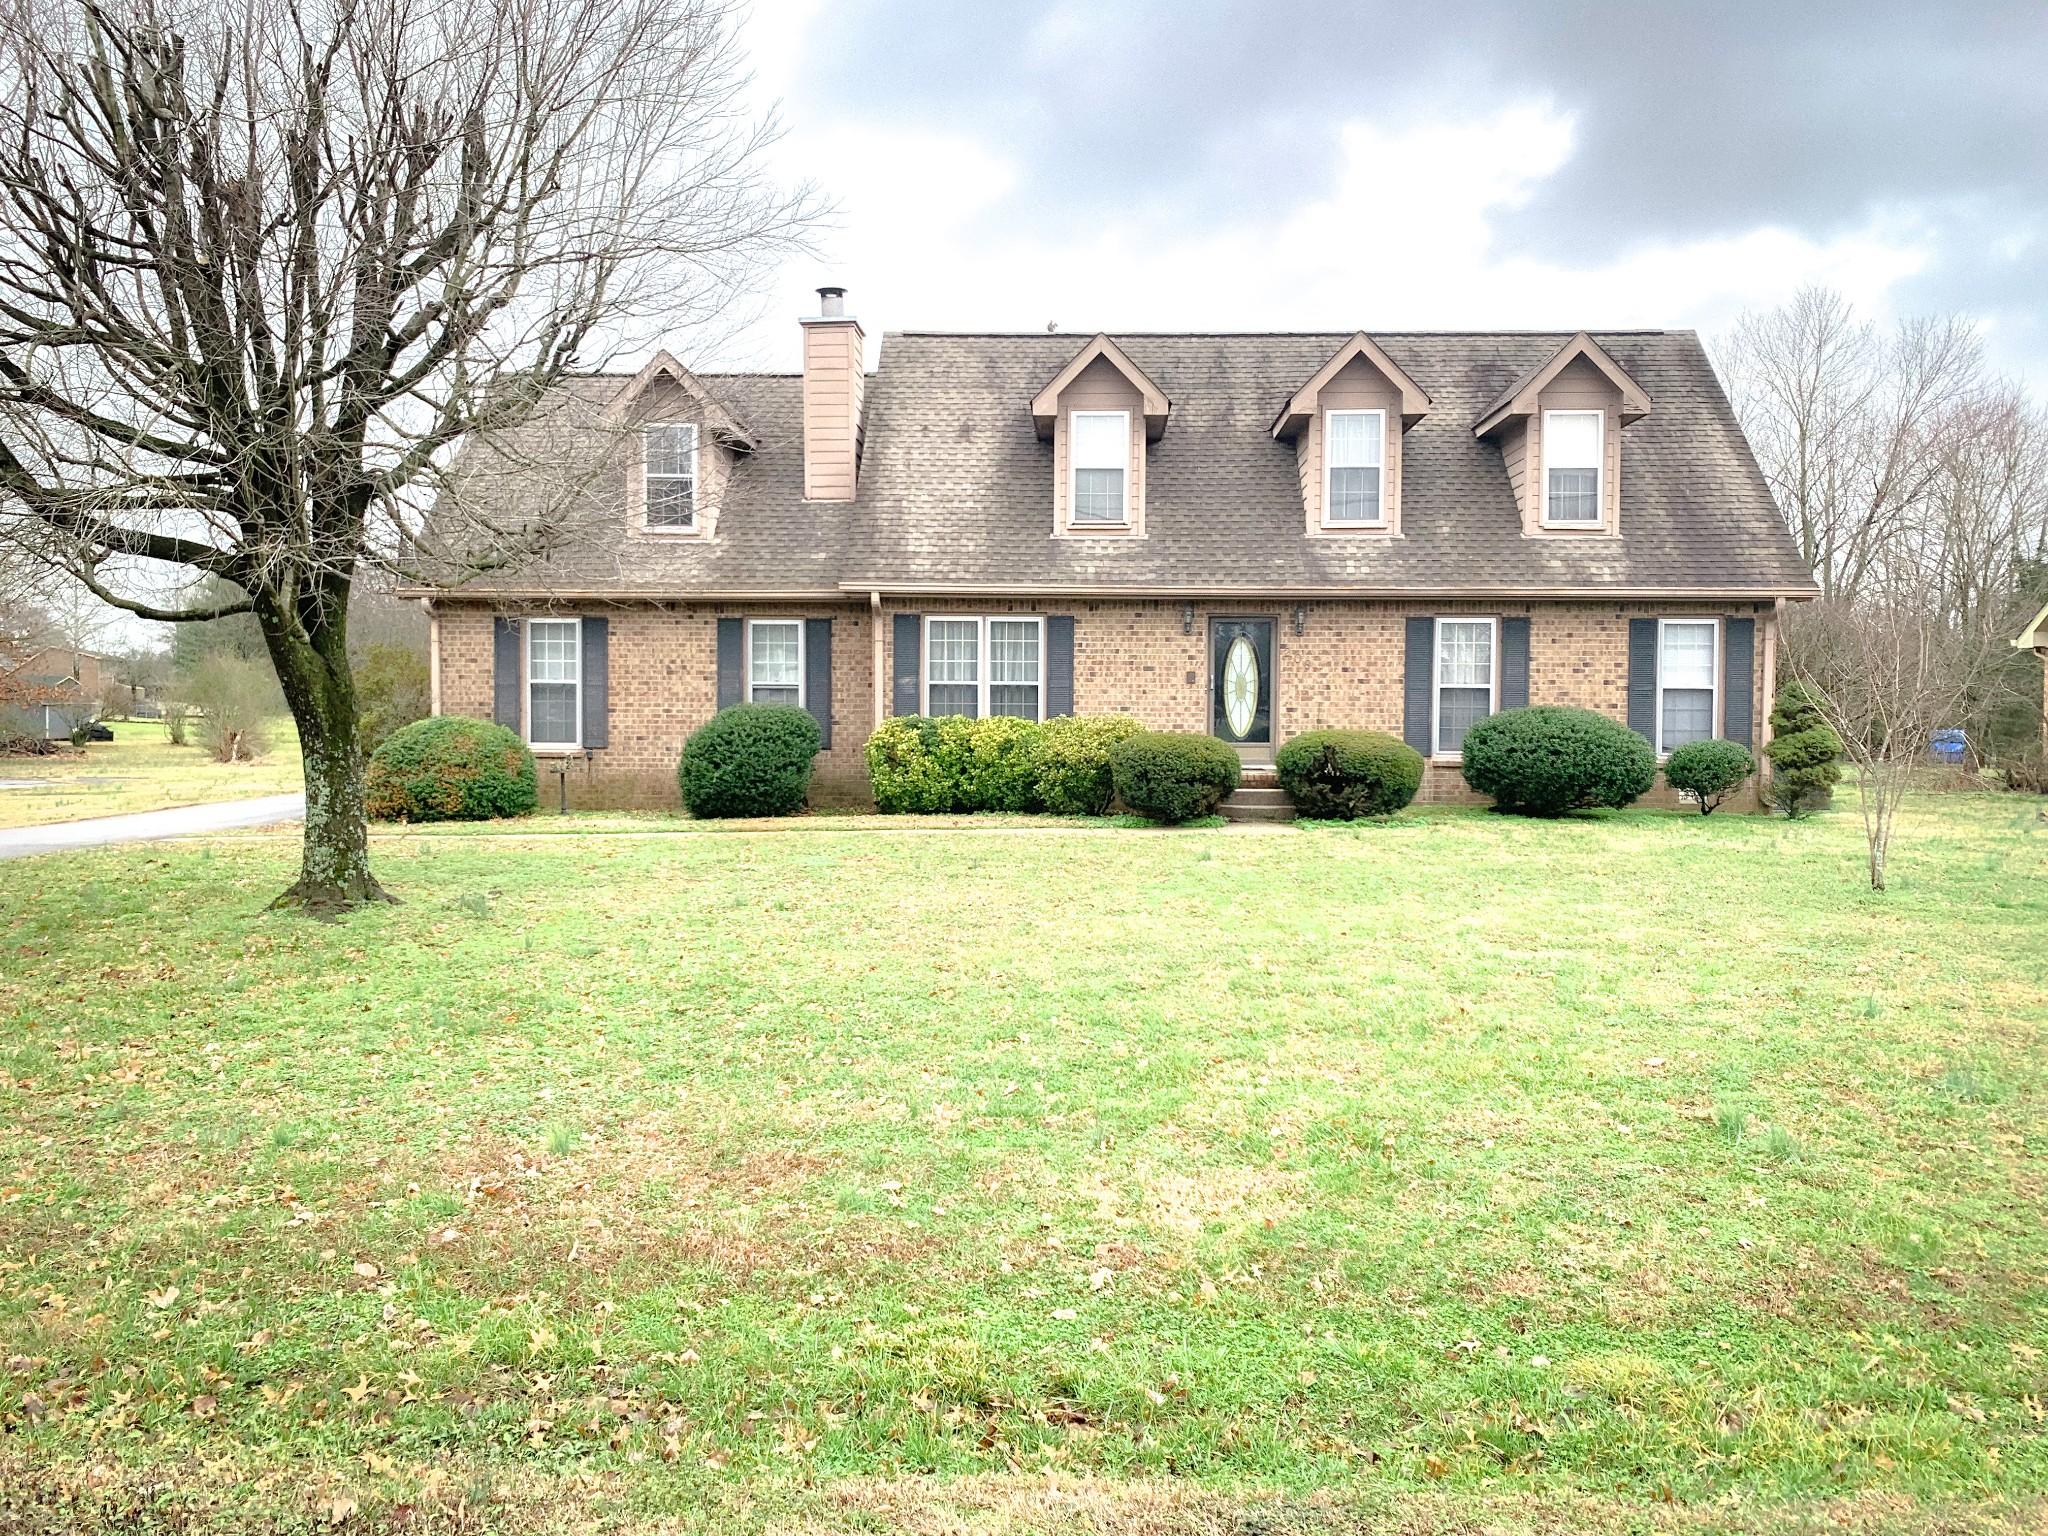 208 Quail Ridge Rd, Smyrna, TN 37167 - Smyrna, TN real estate listing